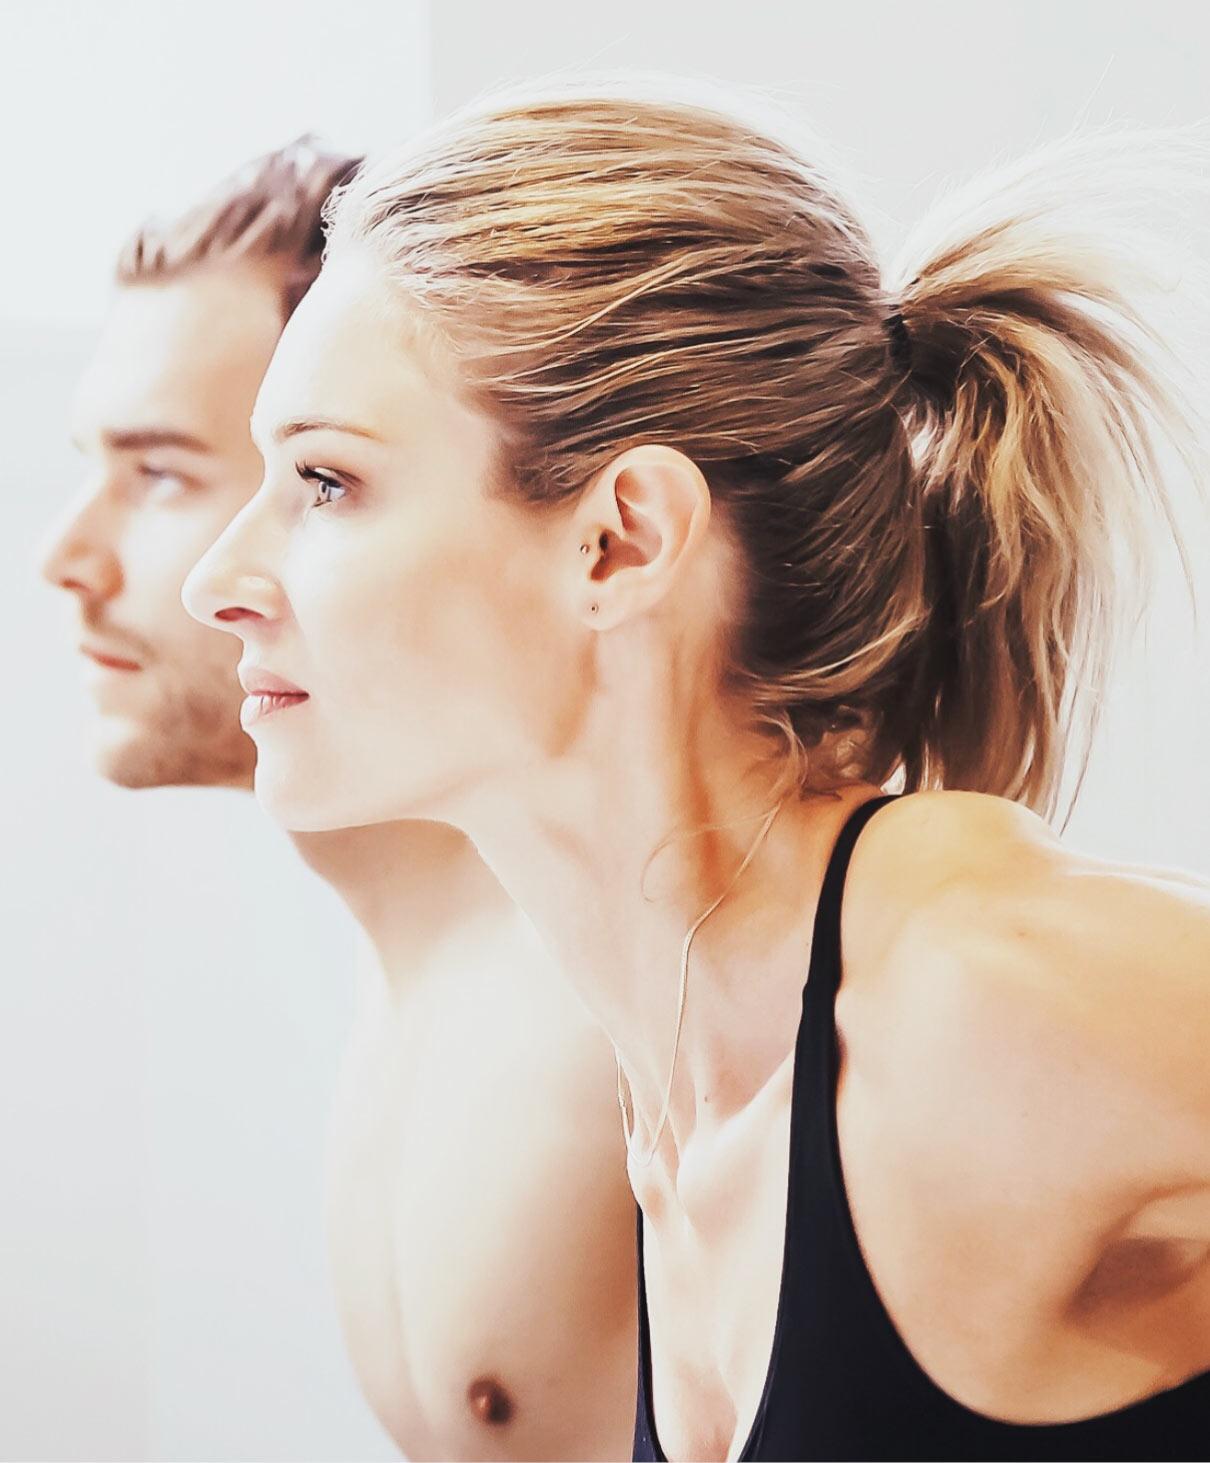 fitness fotografie tip